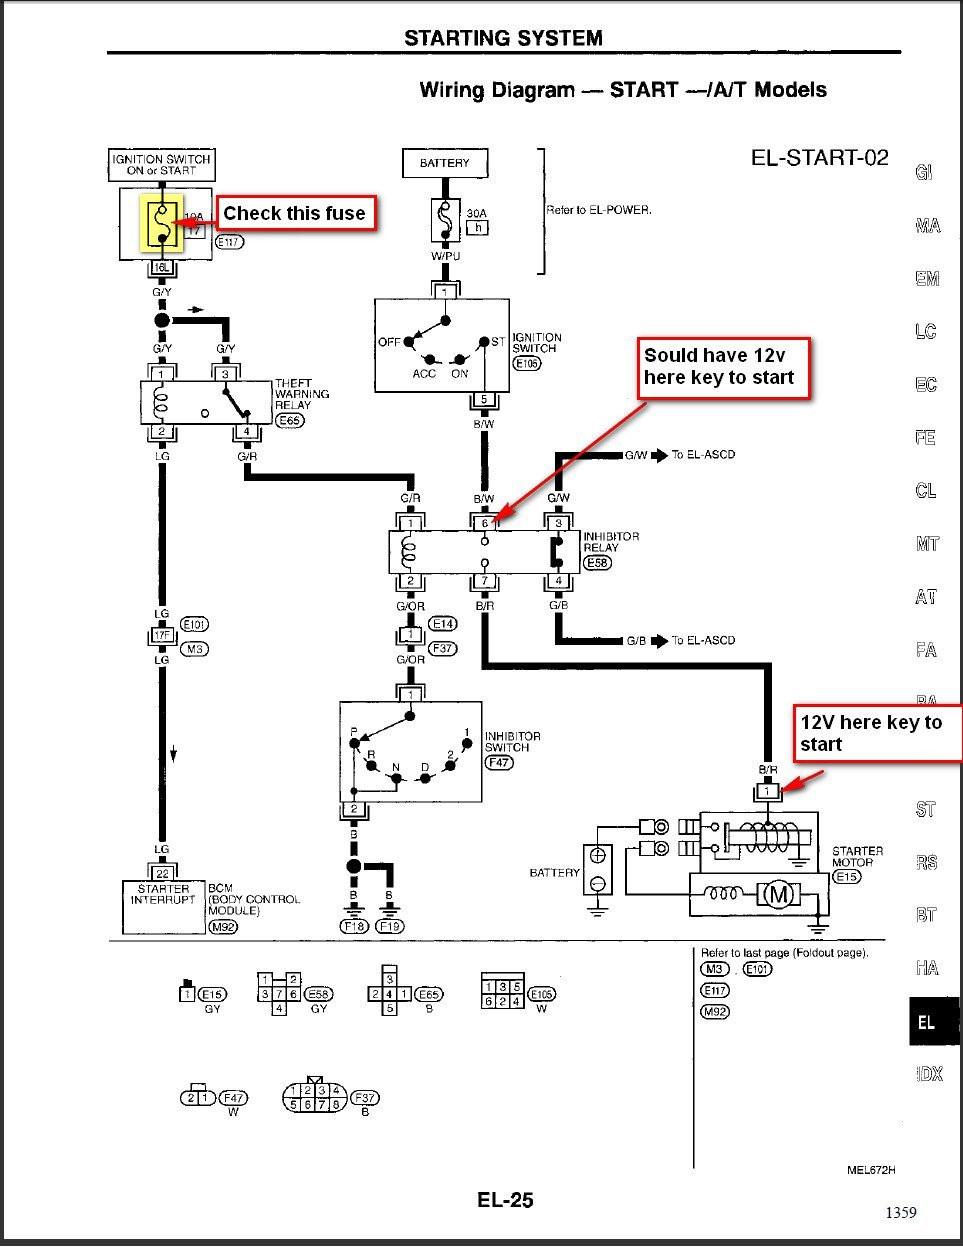 Vsm 900 Wiring Diagram | Manual E-Books - Signal Stat 900 Wiring Diagram